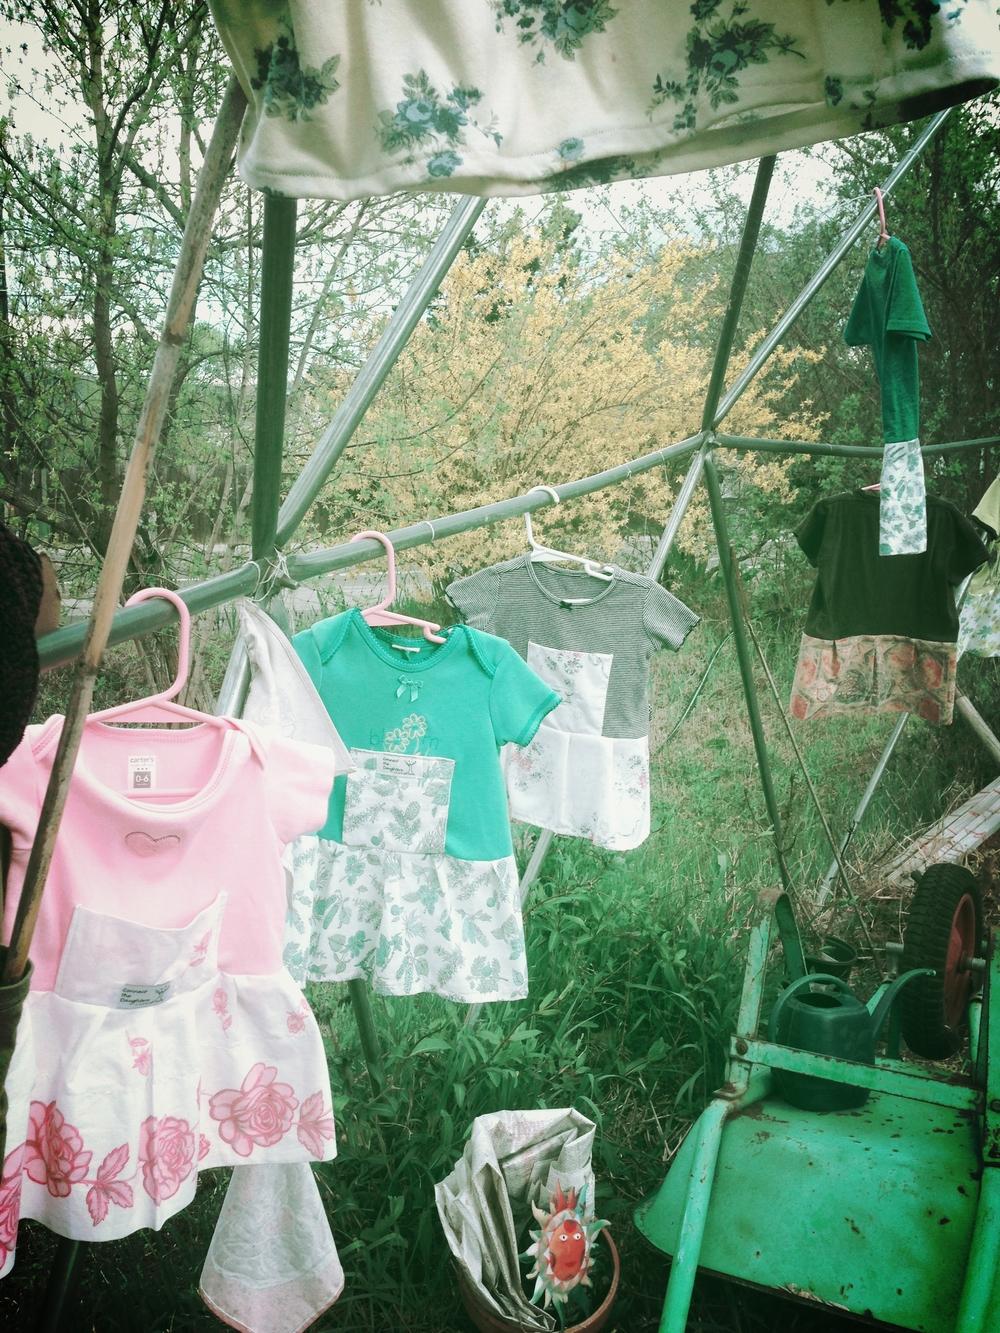 Small Dresses on Dome Far.jpg